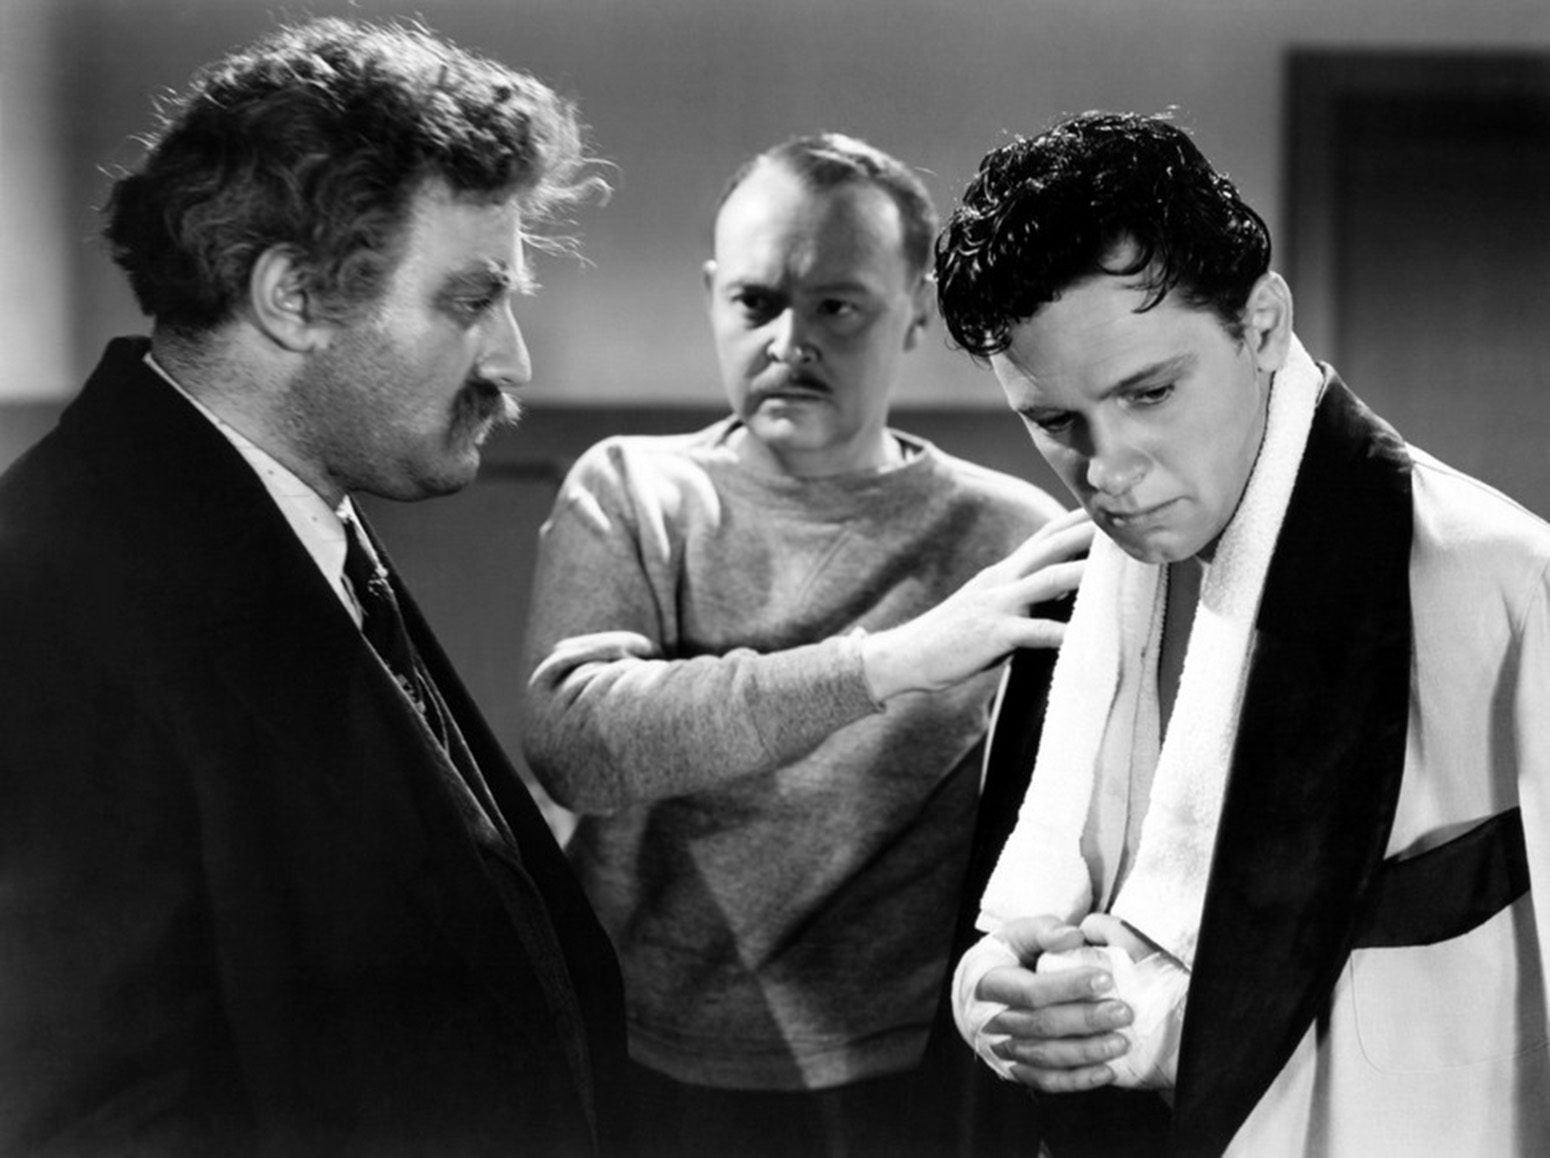 From left: Lee J. Cobb, Don Beddoe and William Holden in Golden Boy.